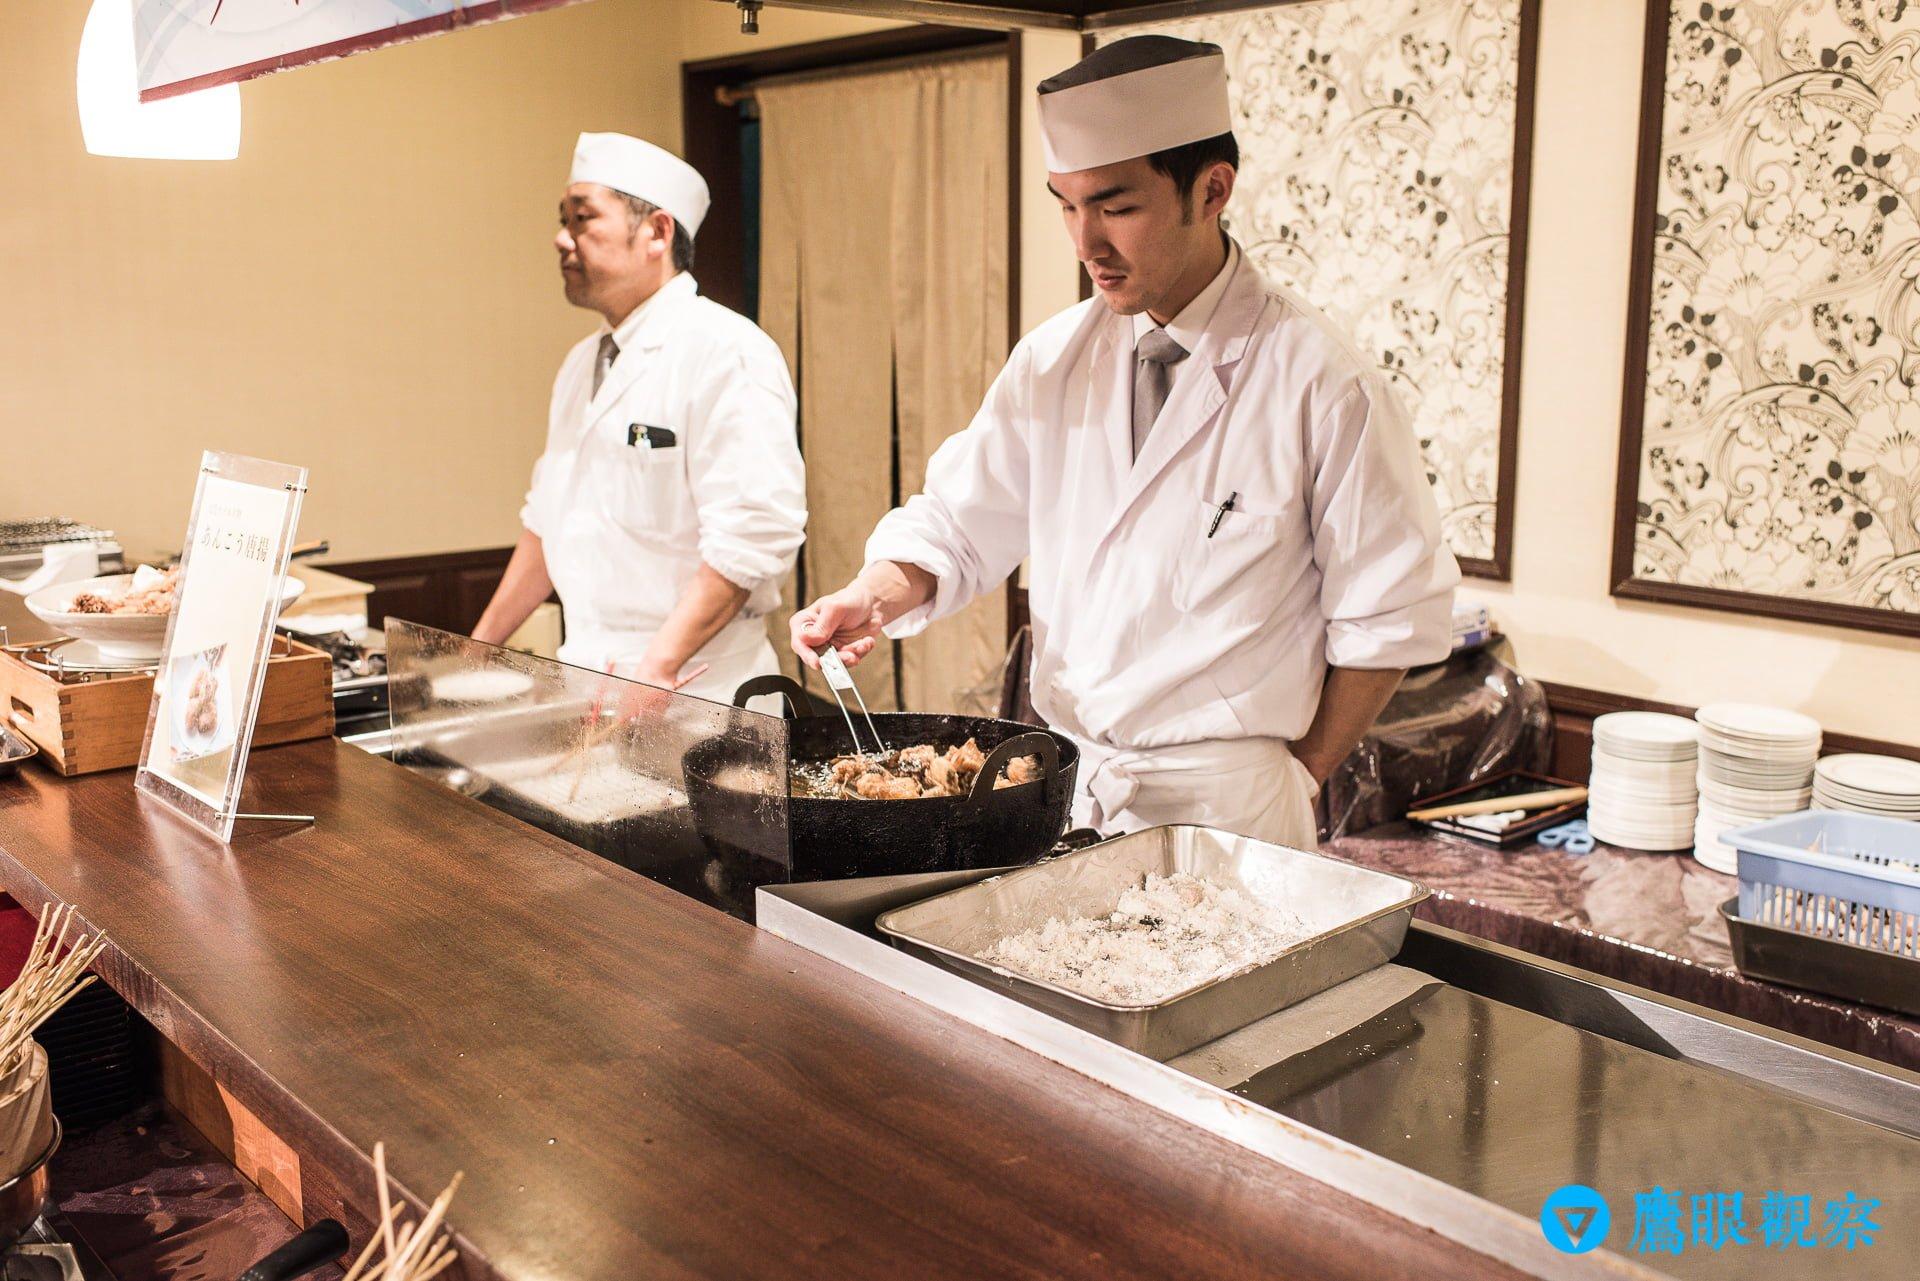 Travel Oarai Hotel in Ibaraki Prefecture Japan 40 日本茨城縣/東茨城/大洗飯店(大洗ホテル)/旅館推薦與住宿旅遊心得分享